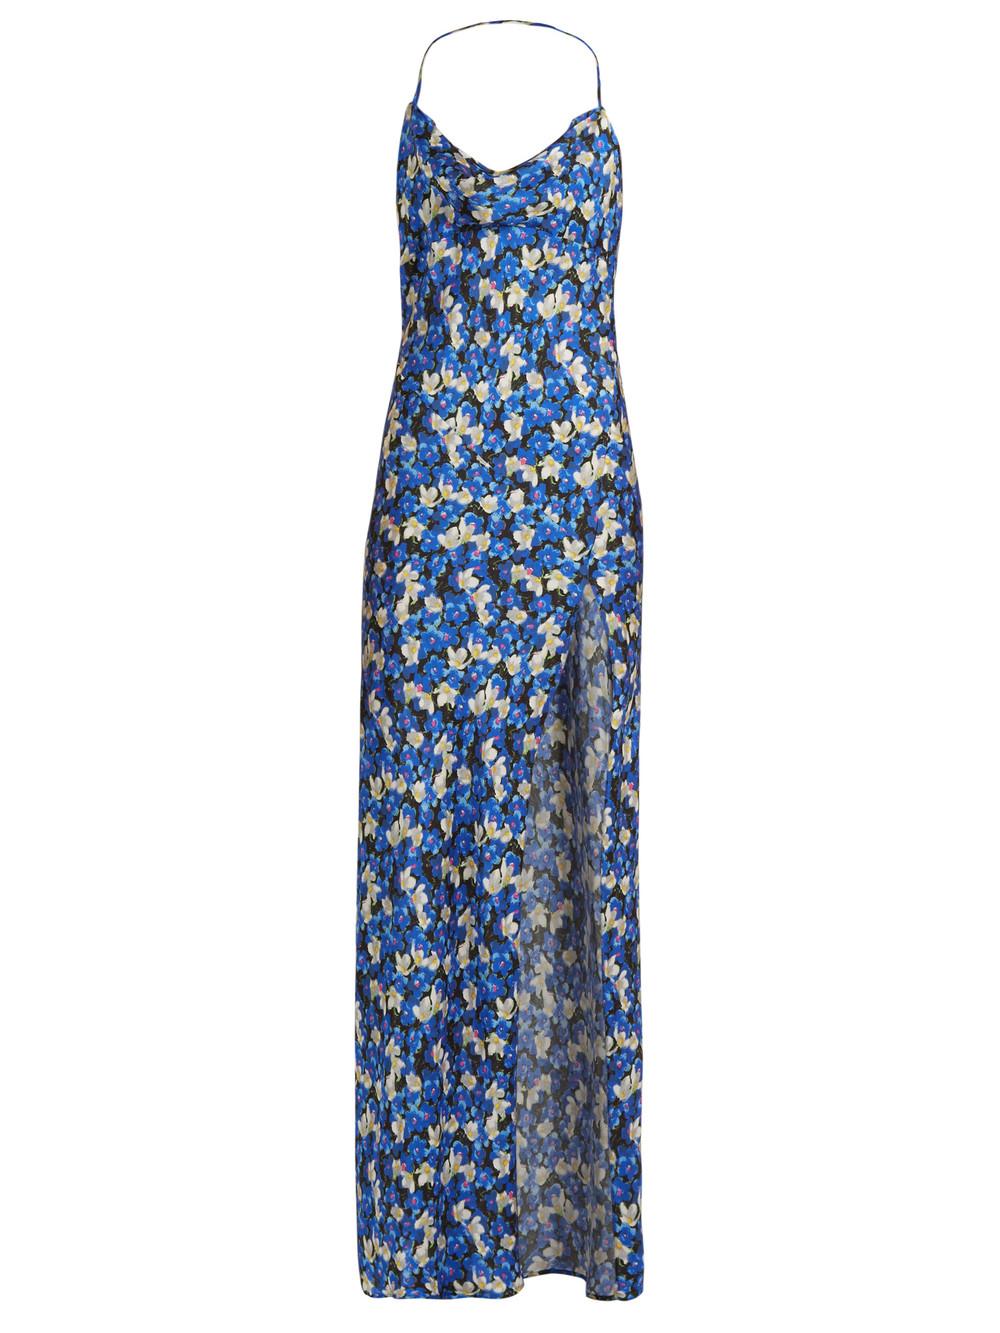 Attico Gabriela Embroidered Silk Satin Wrap Dress Mint